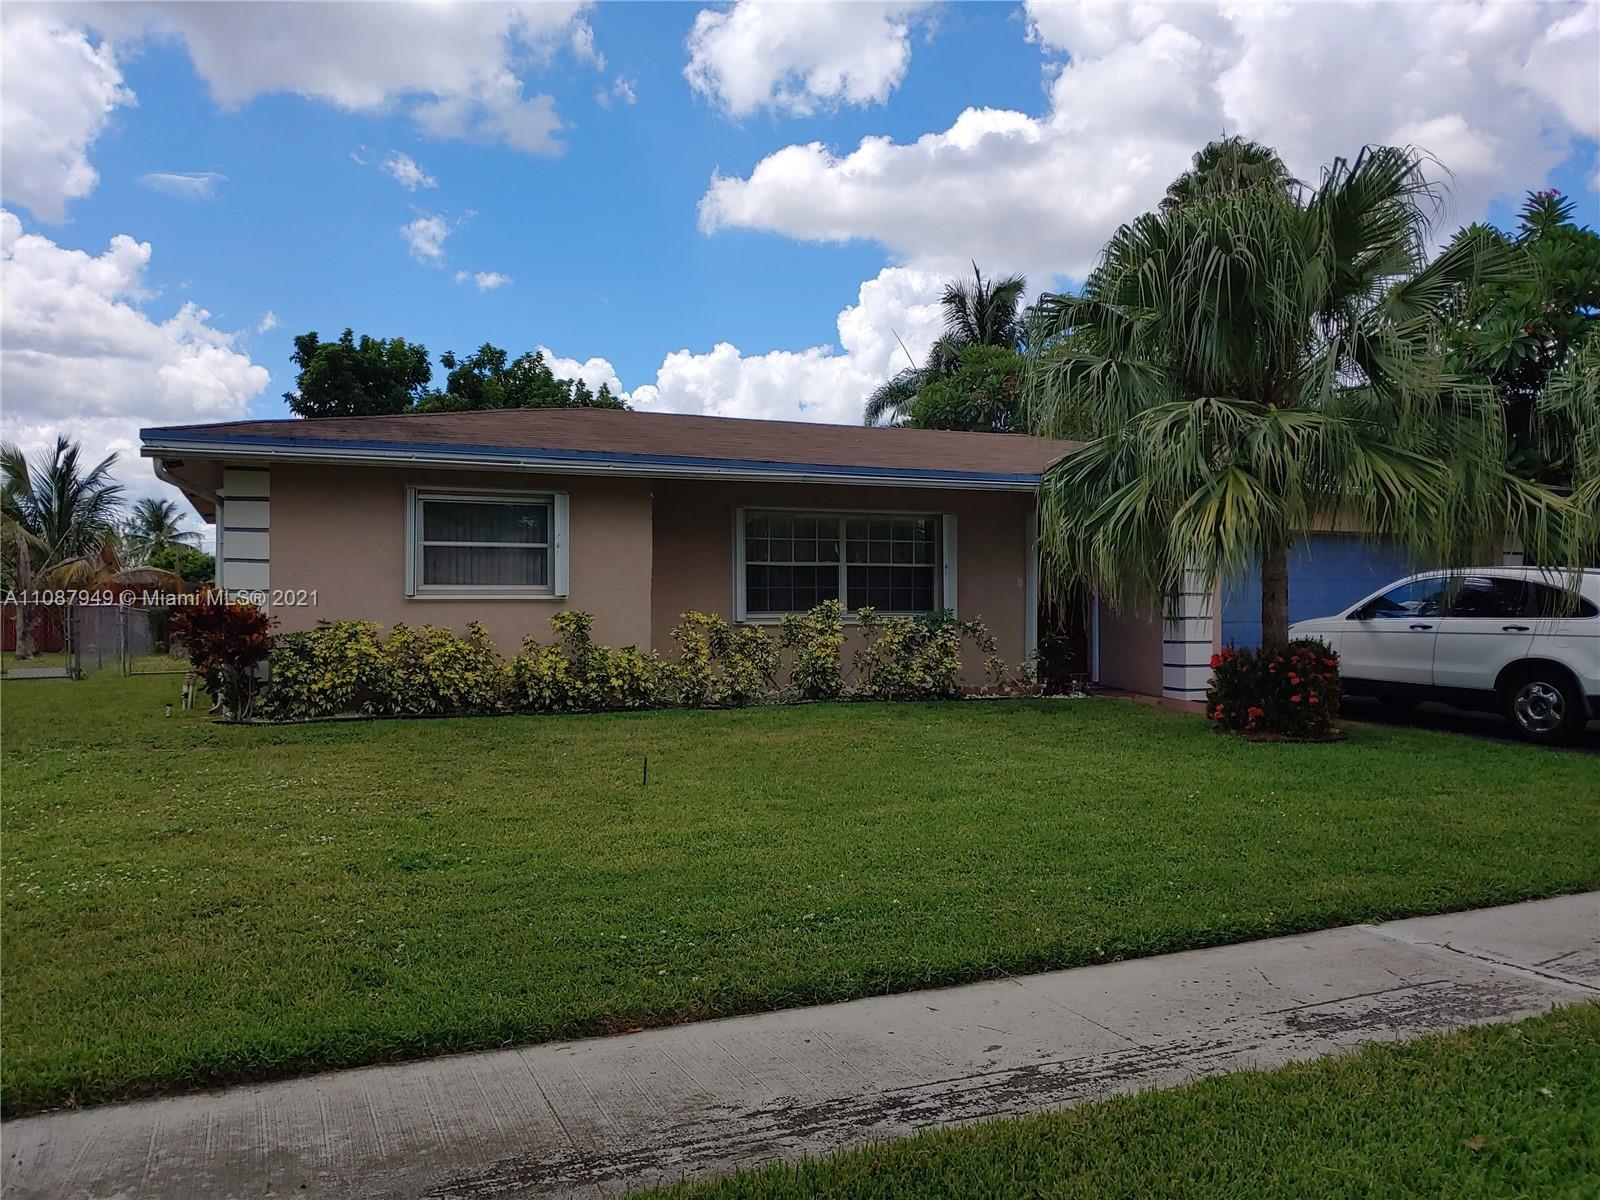 7770 45th Ct, Lauderhill, Florida 33351